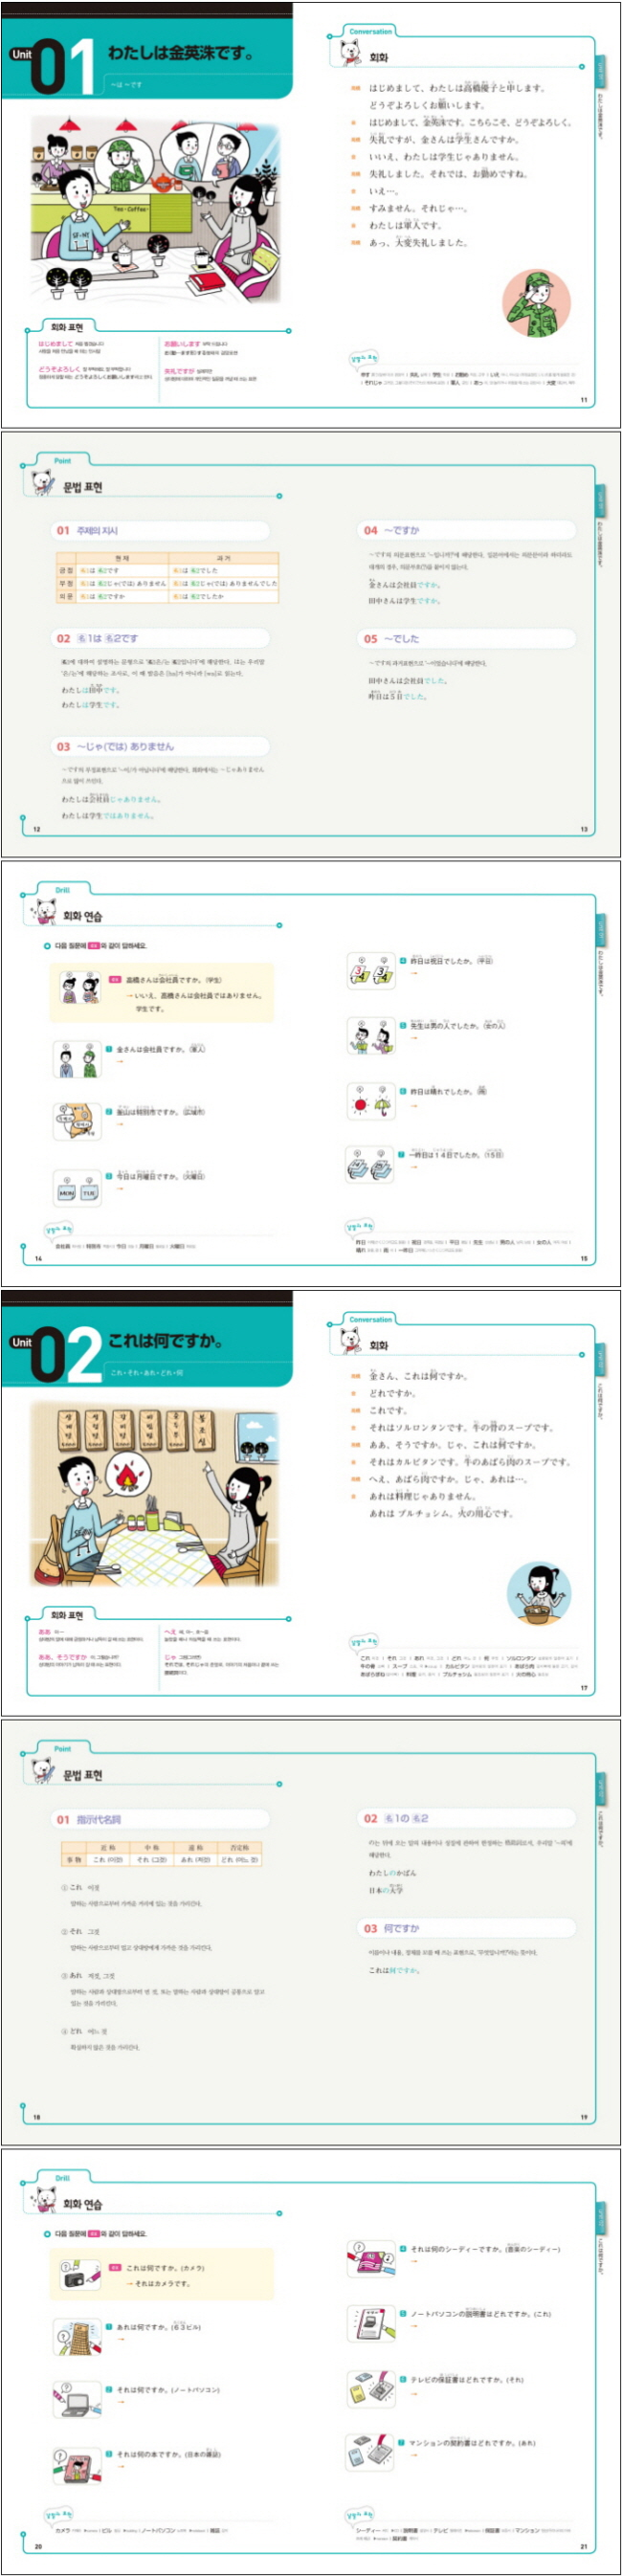 NEW 뱅크 일본어 초급. 1(개정판)(MP3CD1장포함) 도서 상세이미지